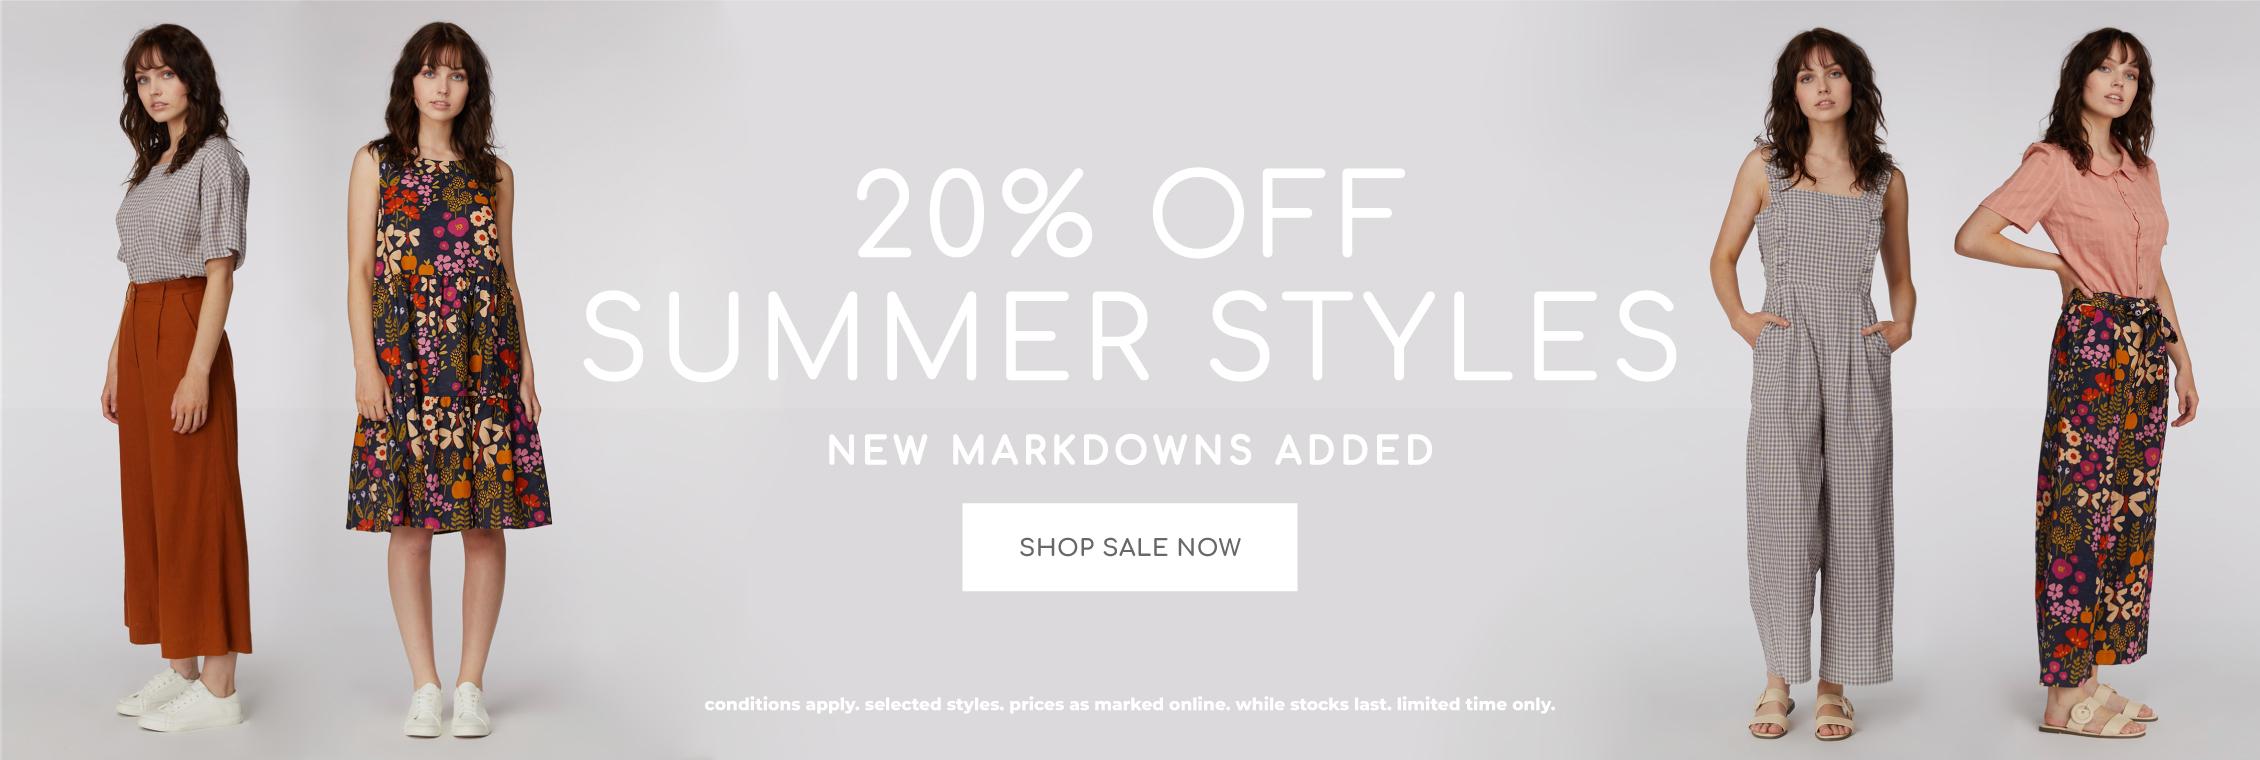 20% off summer